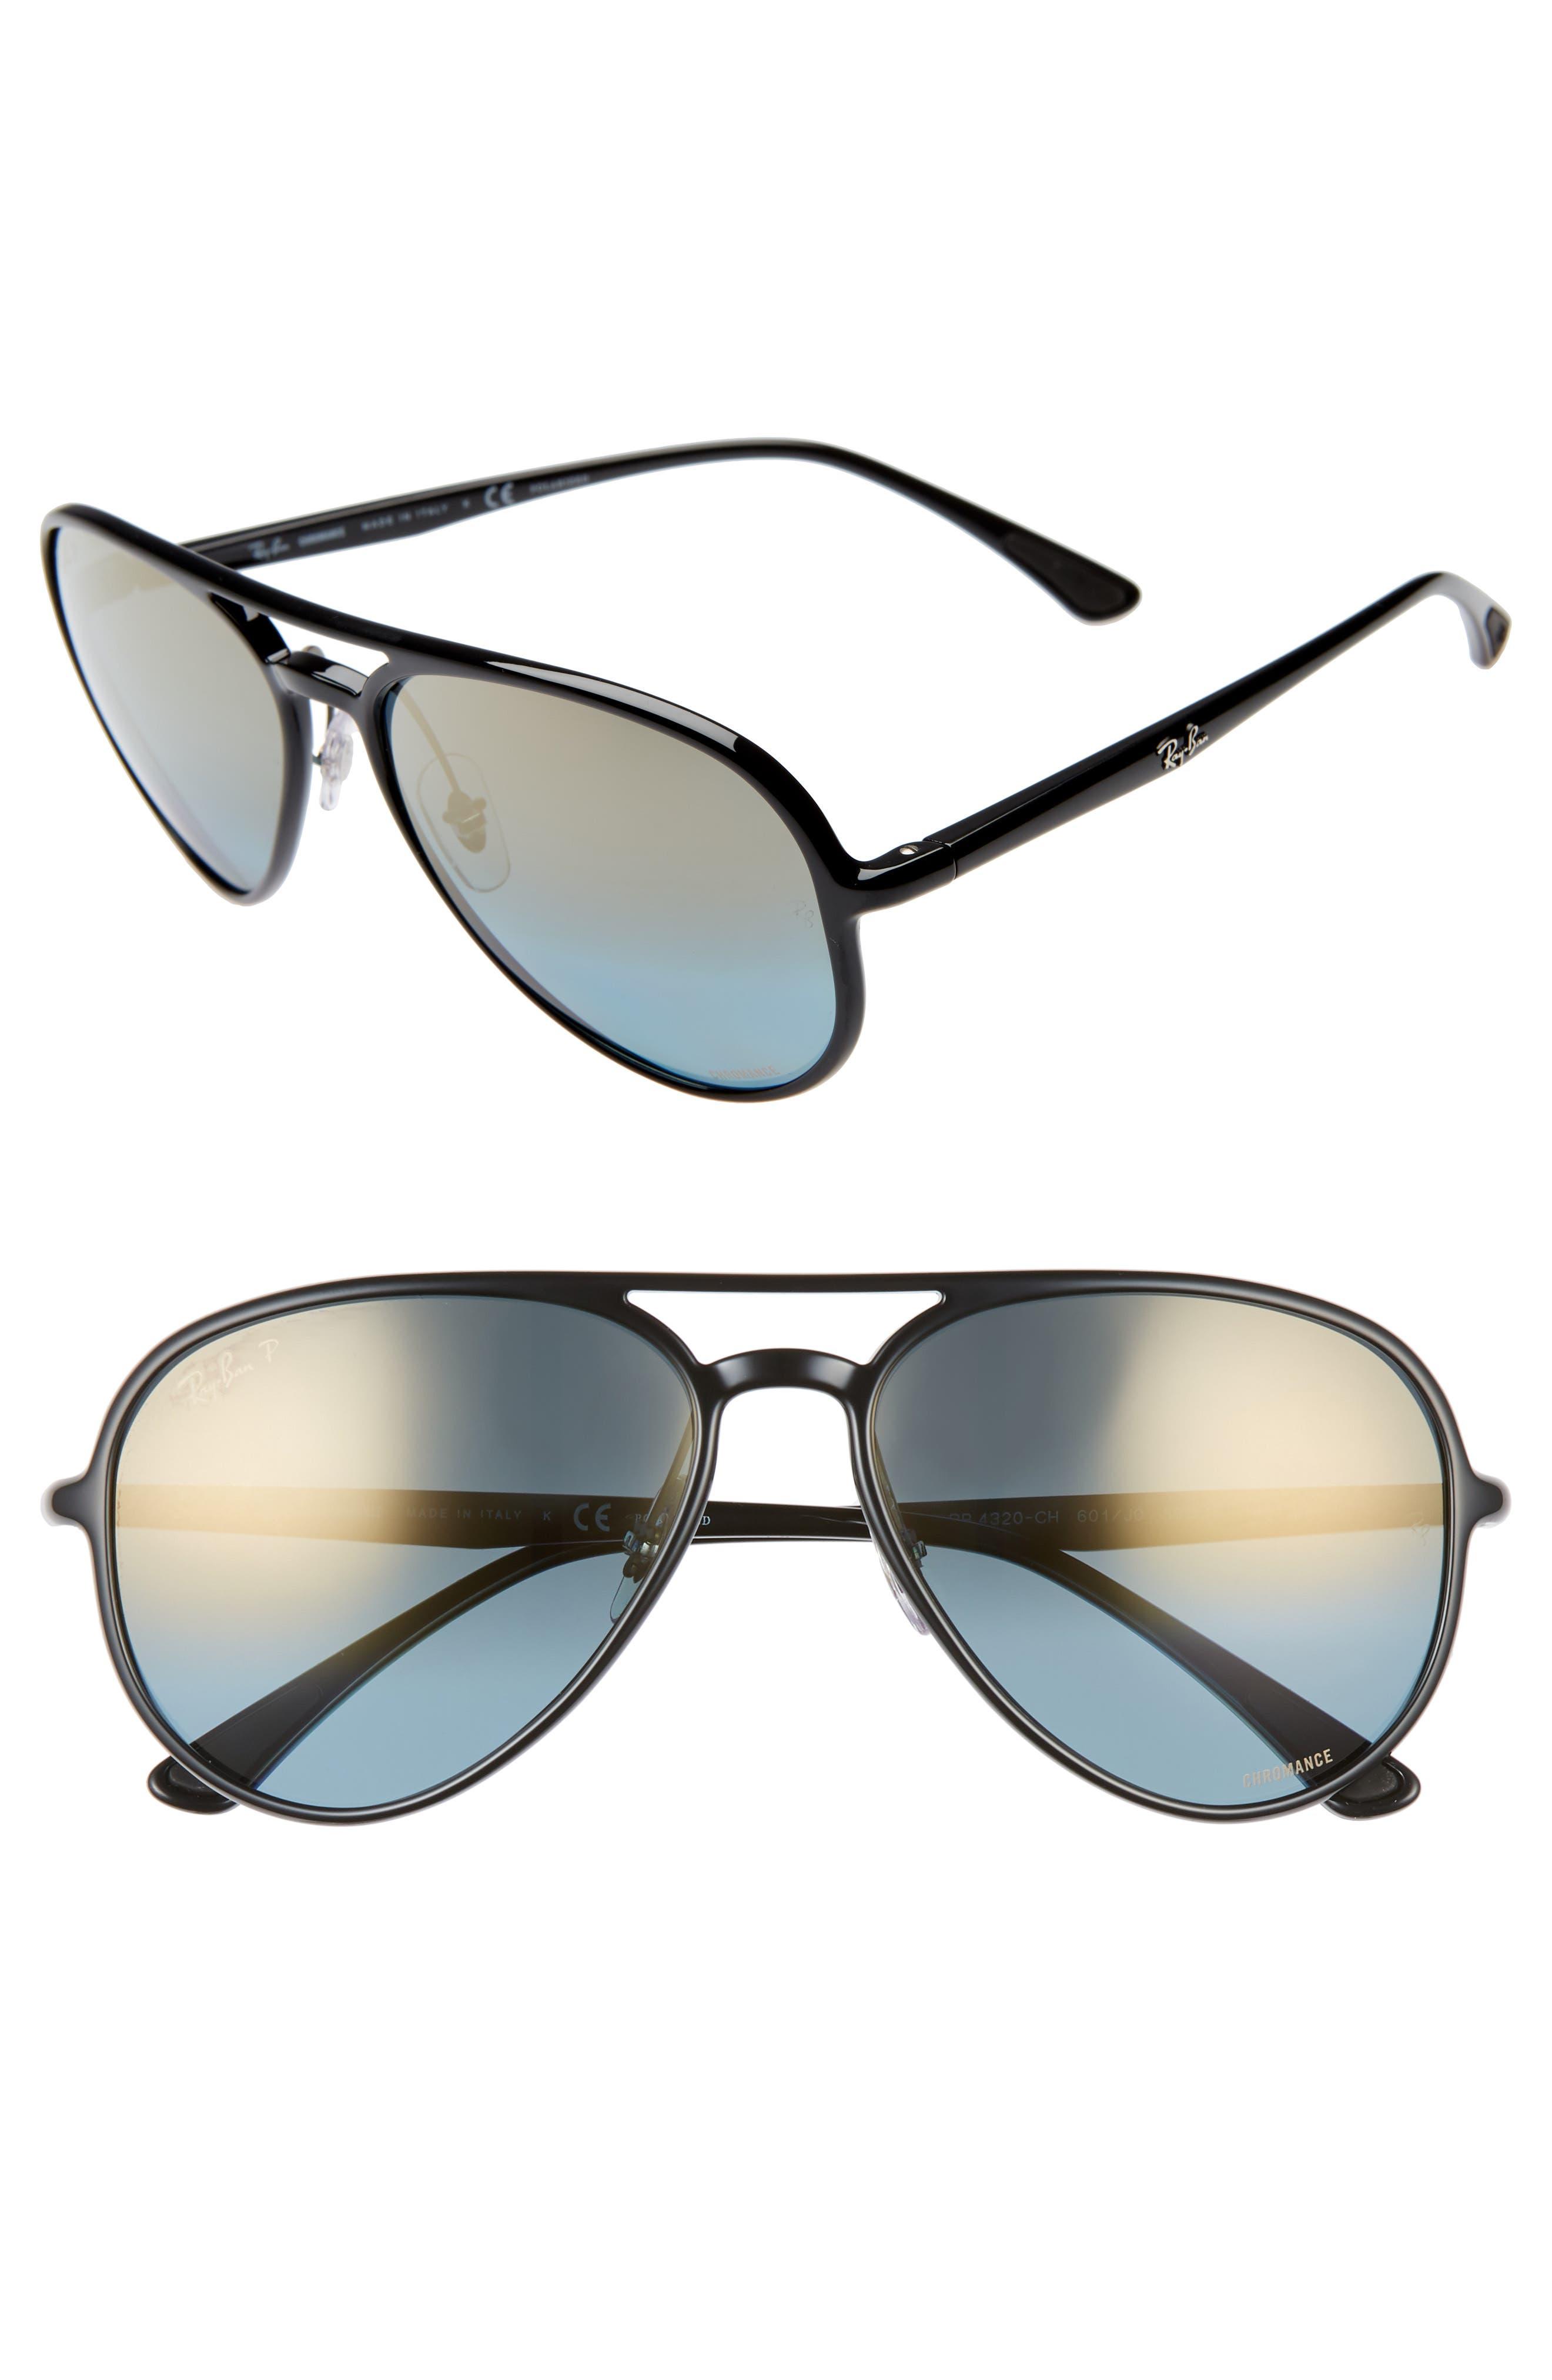 Ray-Ban 5m Chromance Polarized Aviator Sunglasses - Black/ Gold Mirror